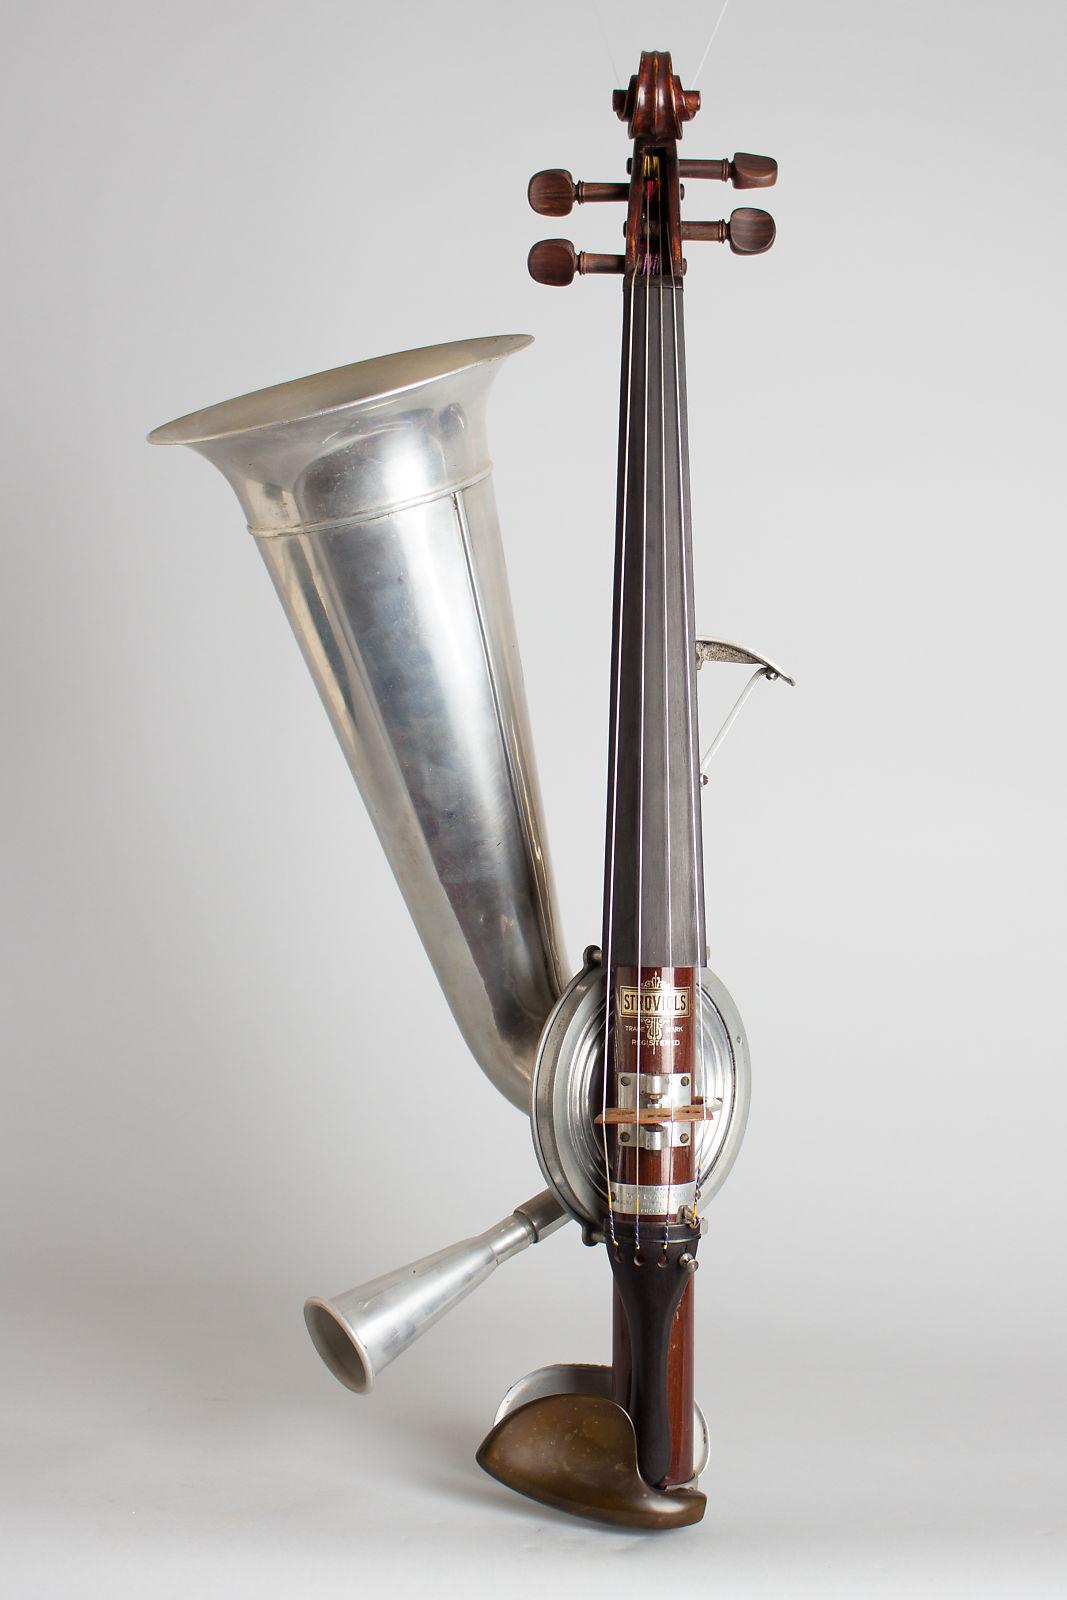 Stroviols Resophonic Viola circa 1910